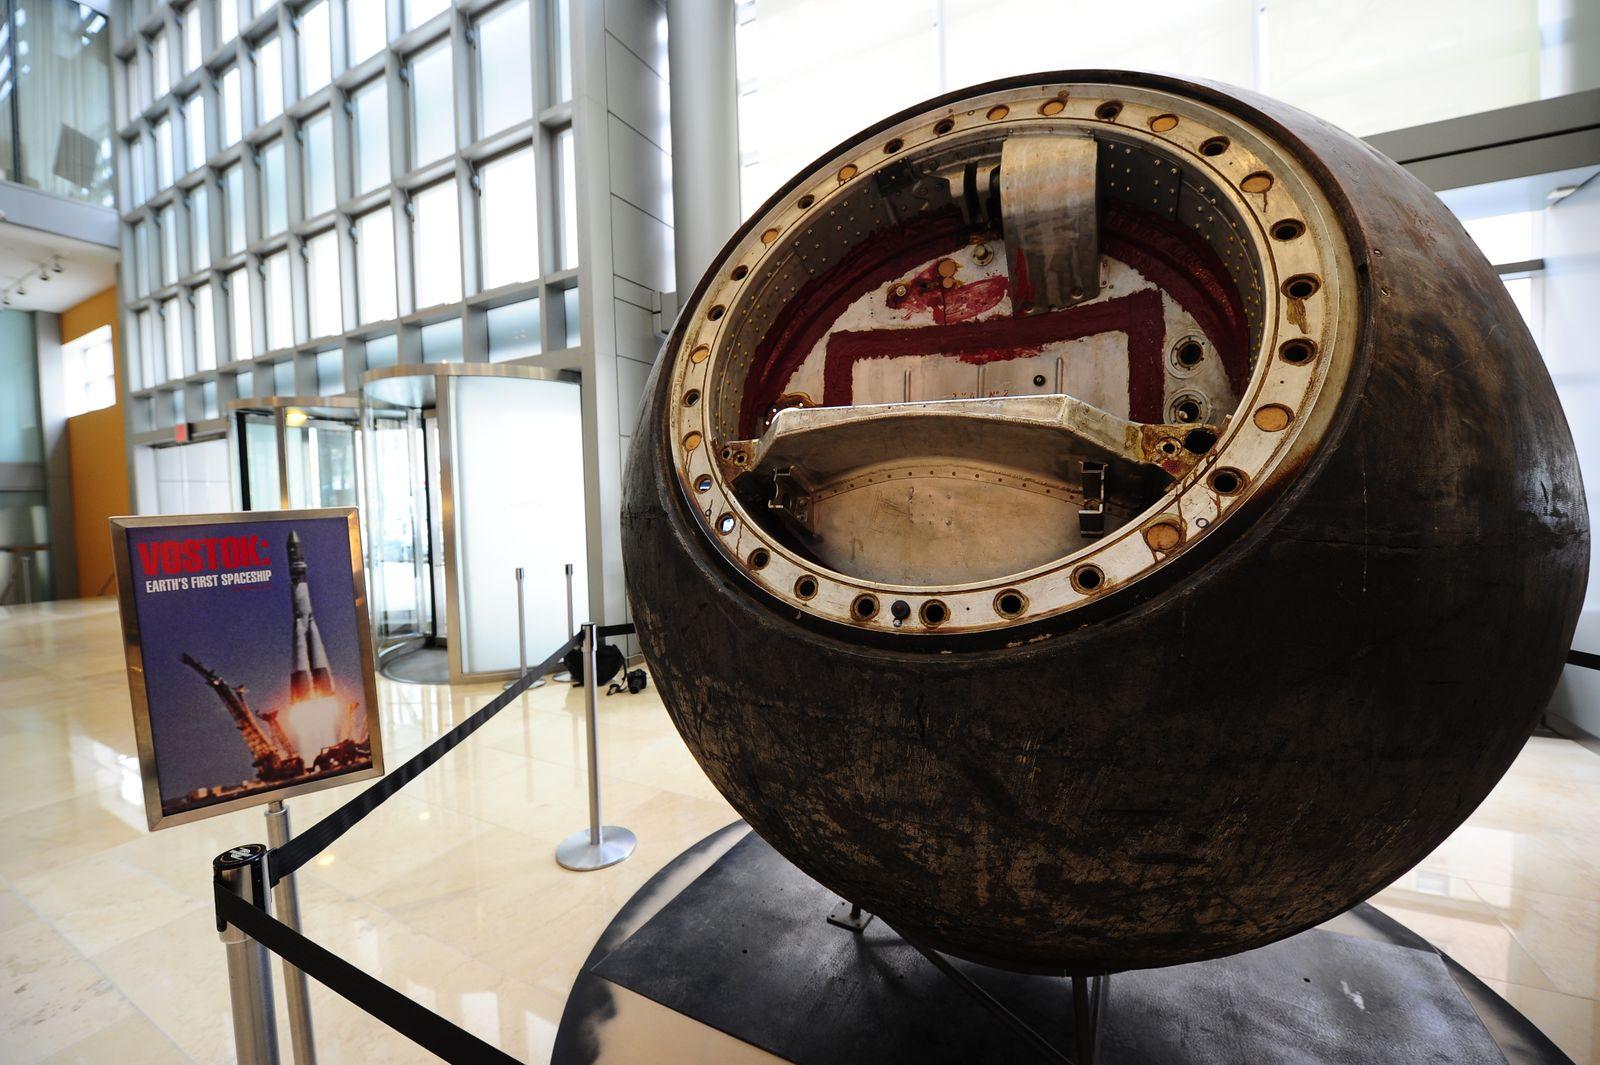 Sotheby's versteigert Raumschiff / historische sowjetische Wostok-Kapsel